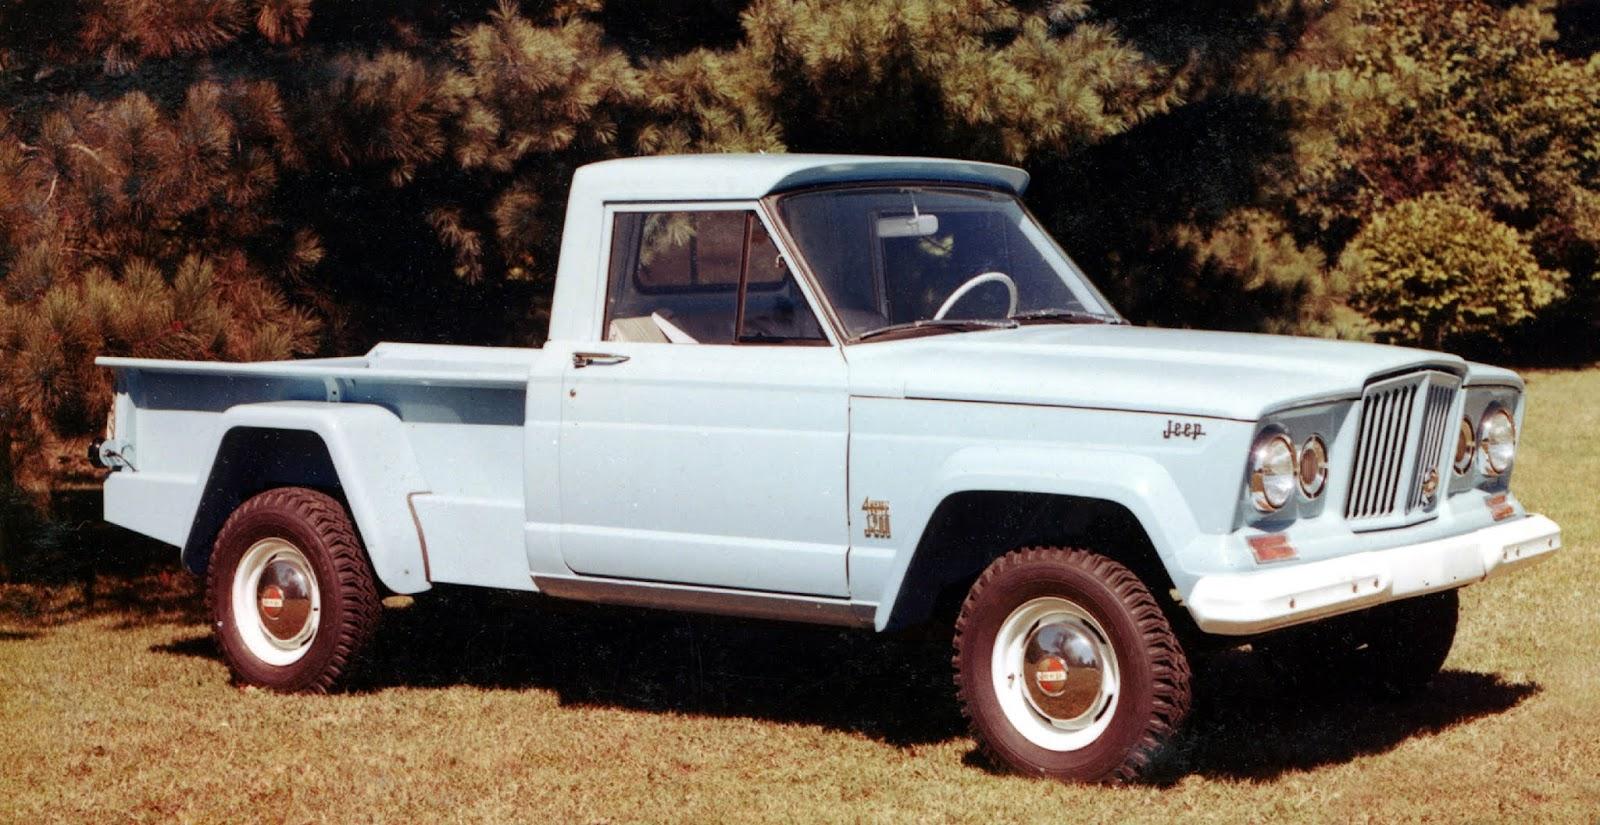 1963 Jeep Gladiator J 200 To Jeep Gladiator, έρχεται να αλλάξει τα δεδομένα στην κατηγορία των pick-up Gladiator, Jeep, Jeep Gladiator, zblog, ειδήσεις